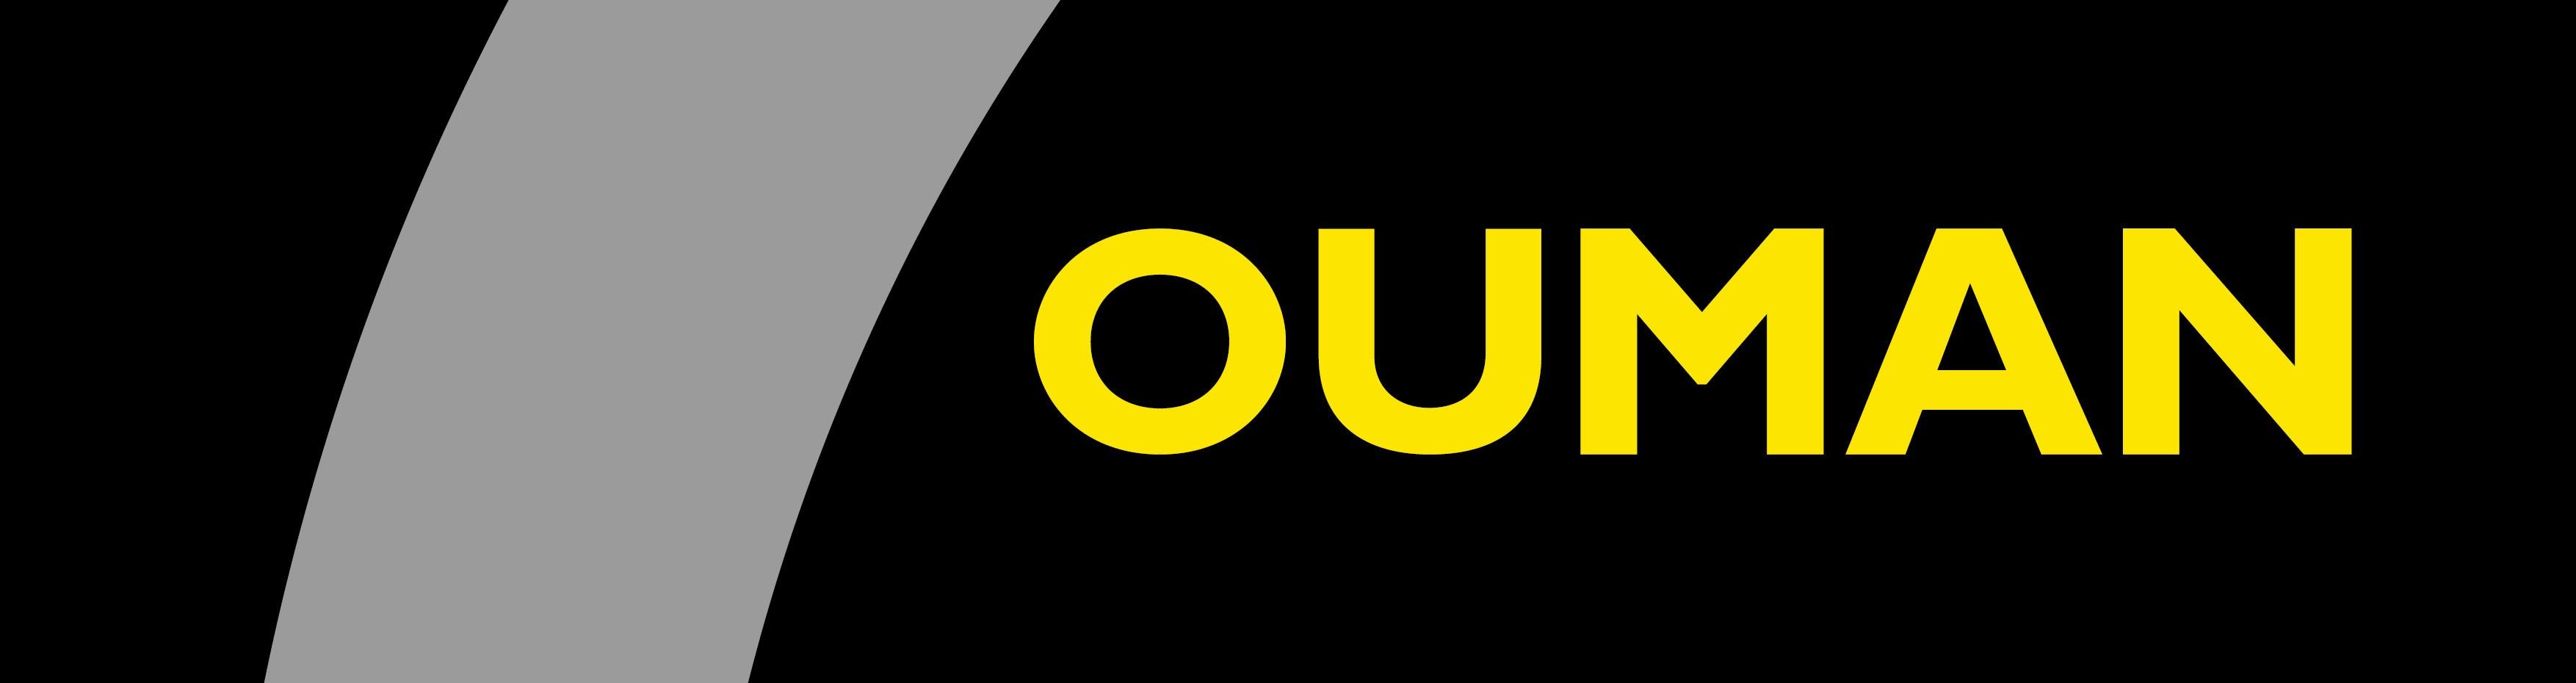 Ouman logo